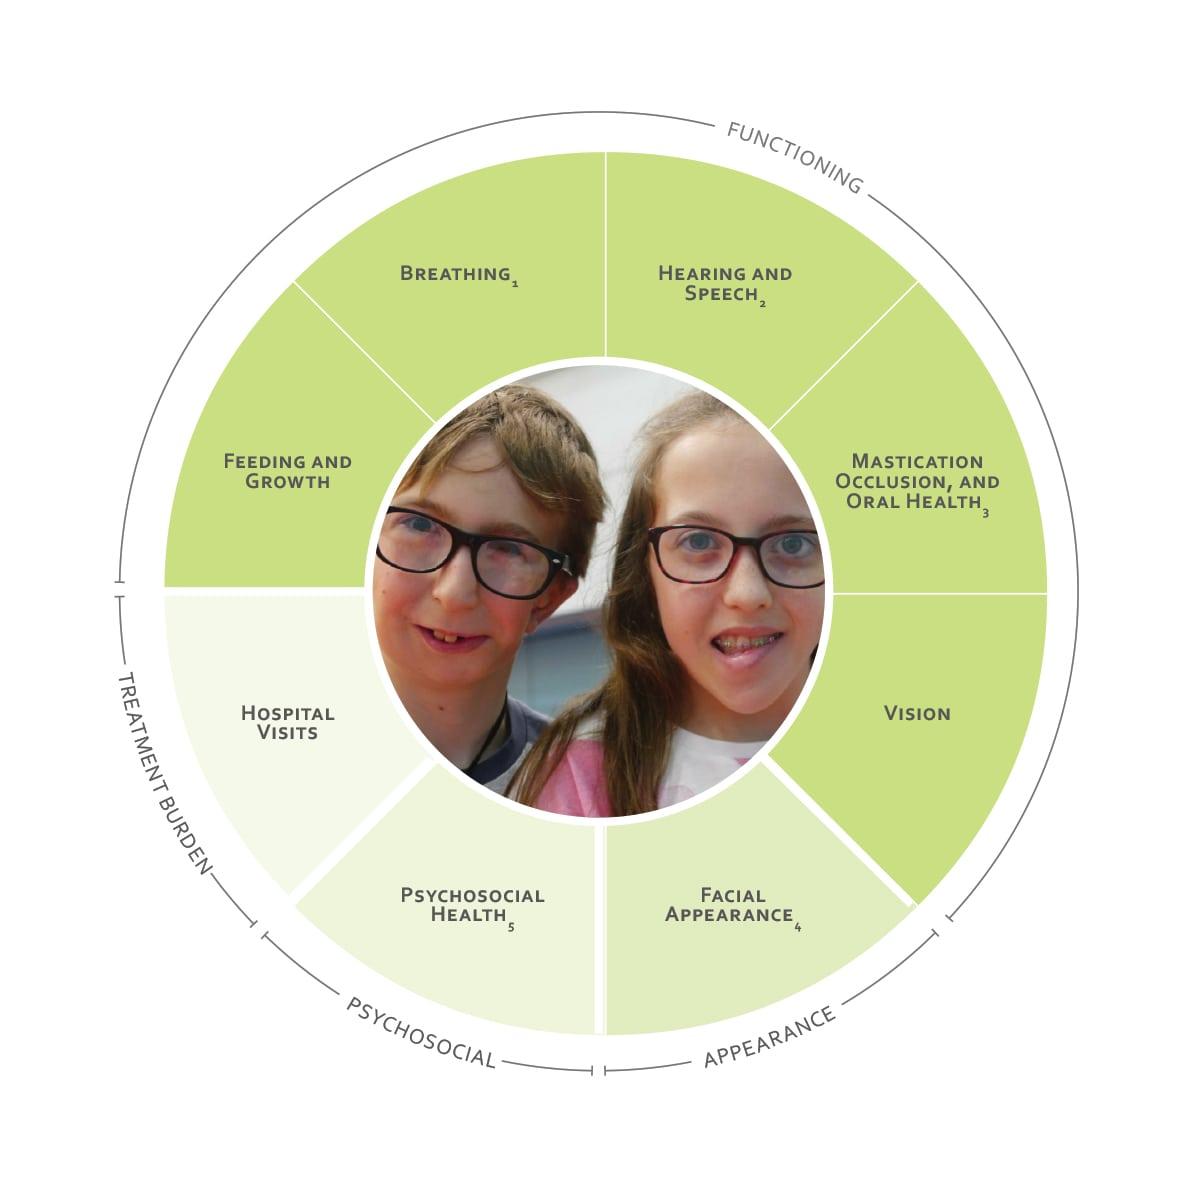 ICHOM Standard Sets Craniofacial Microsomia Outcomes Wheel